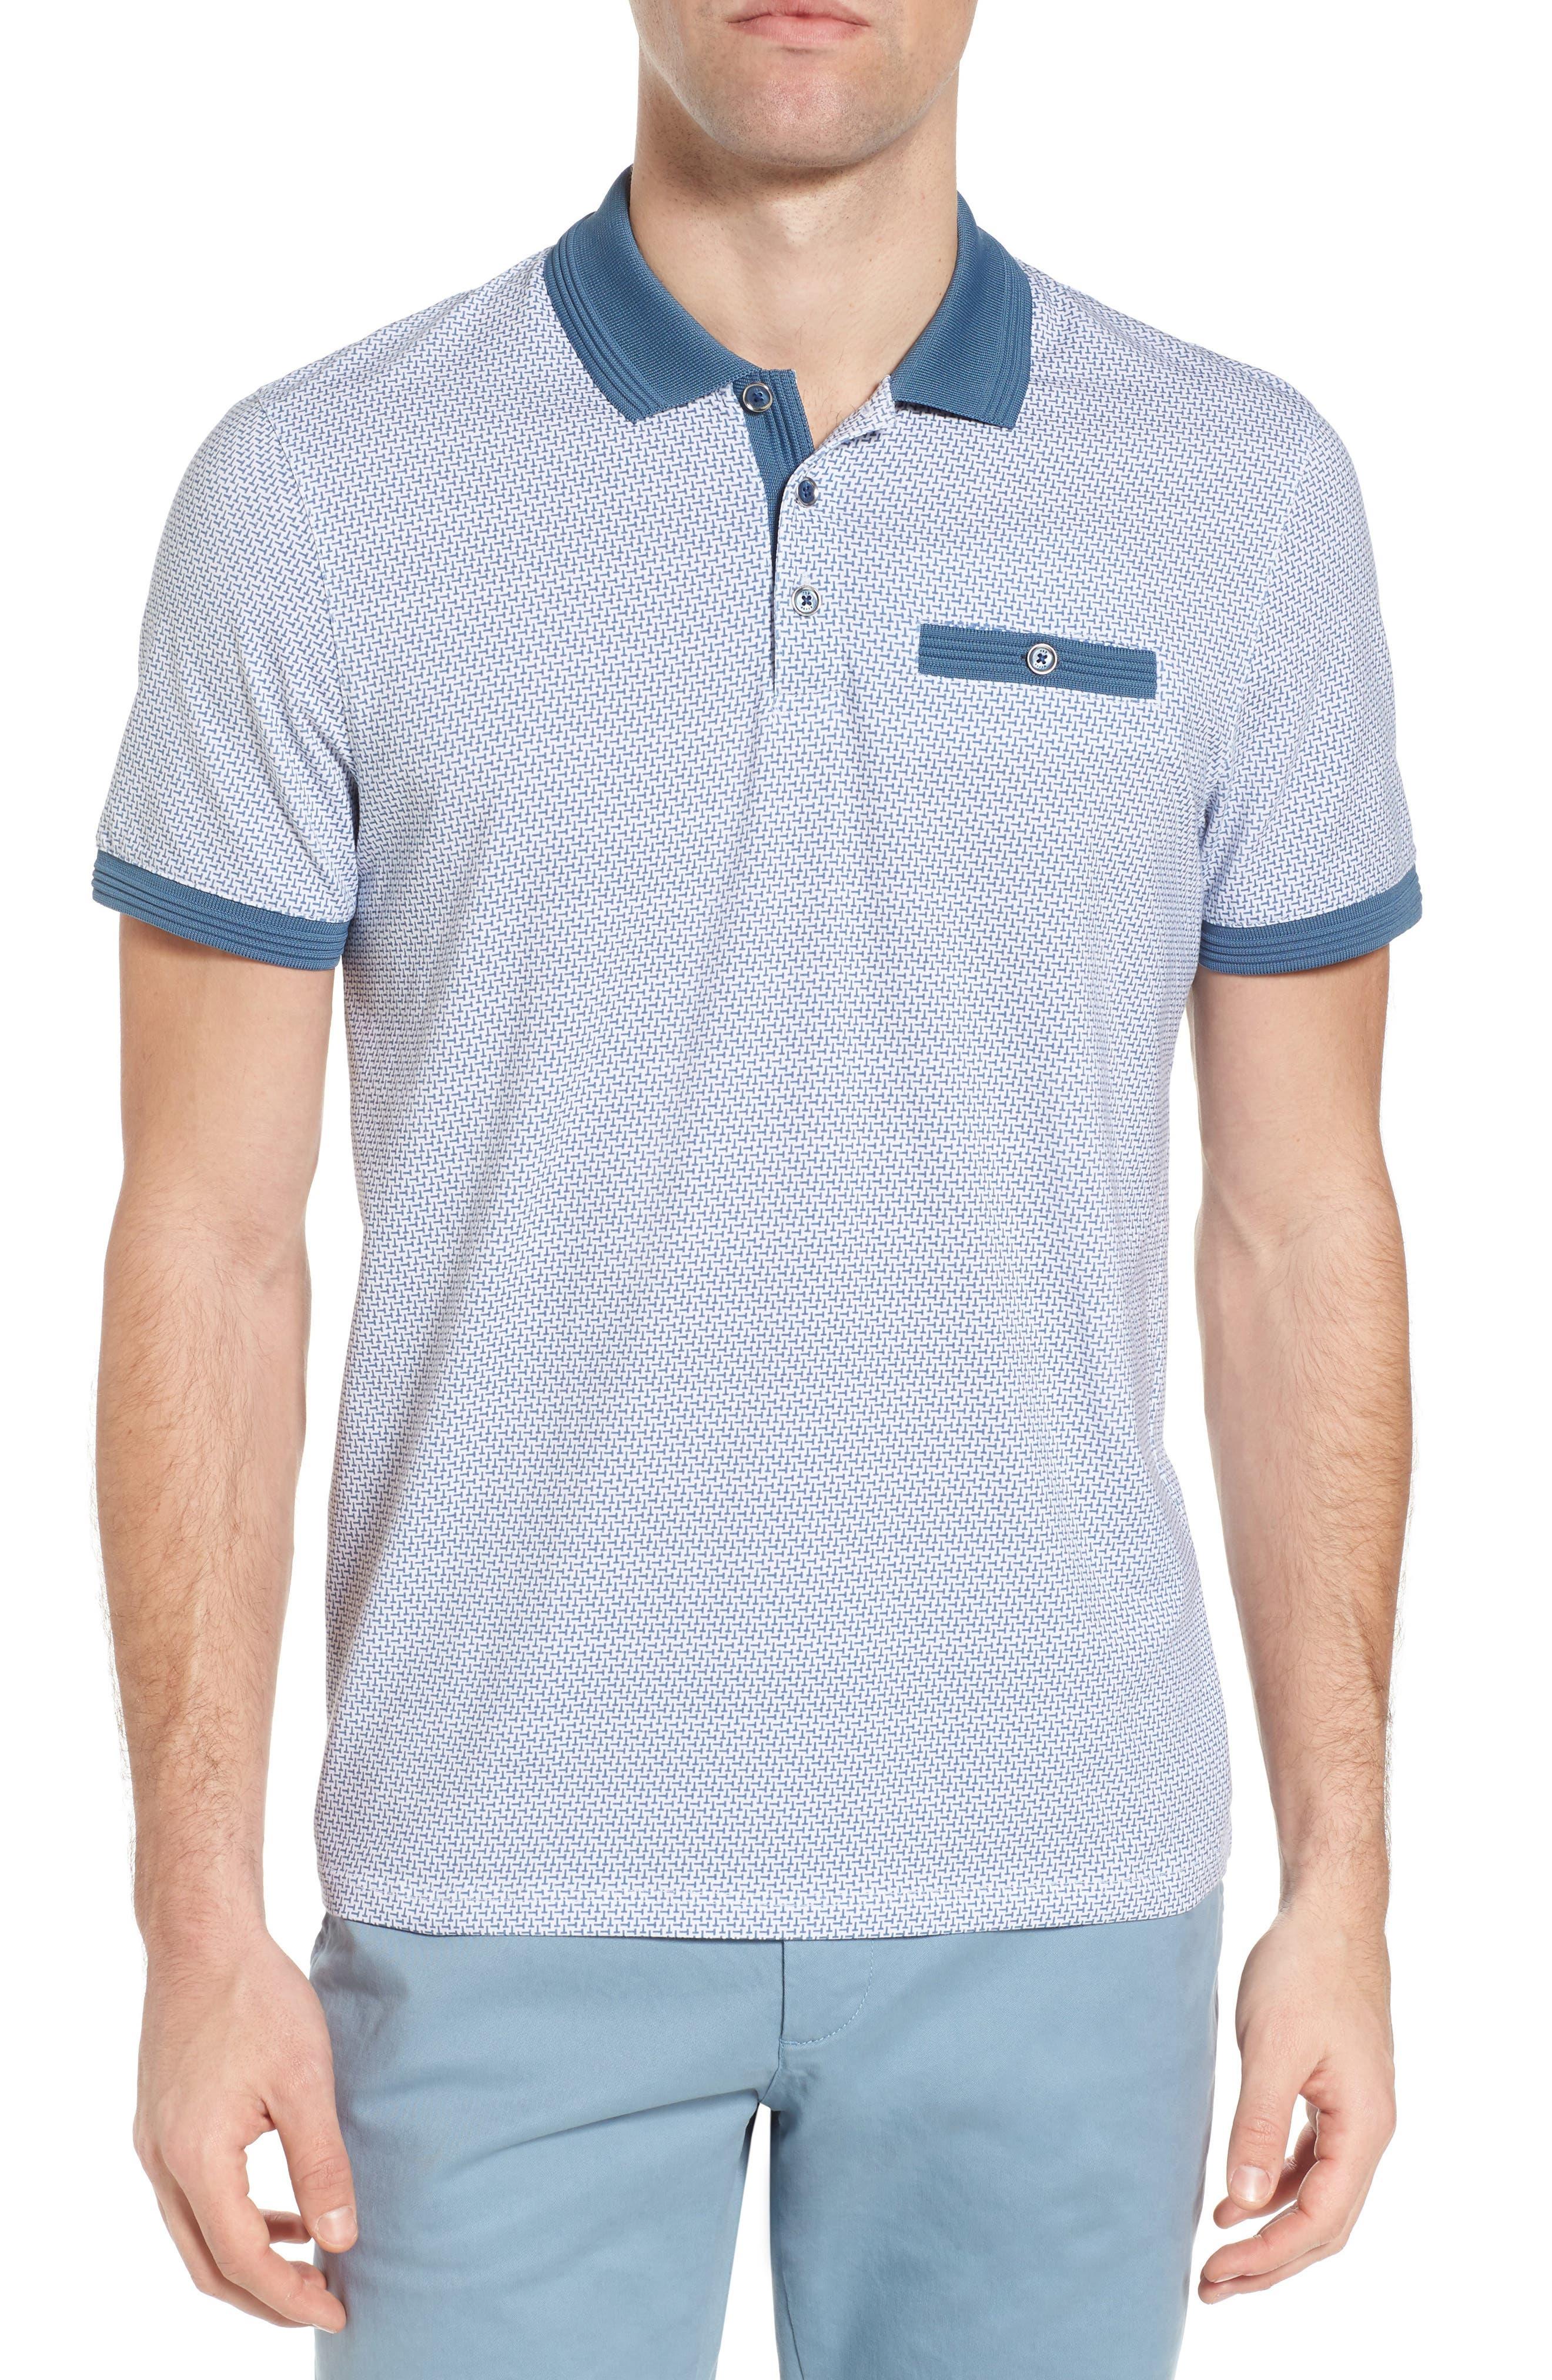 Sloughi Trim Fit Stretch Polo Shirt,                             Main thumbnail 1, color,                             Blue